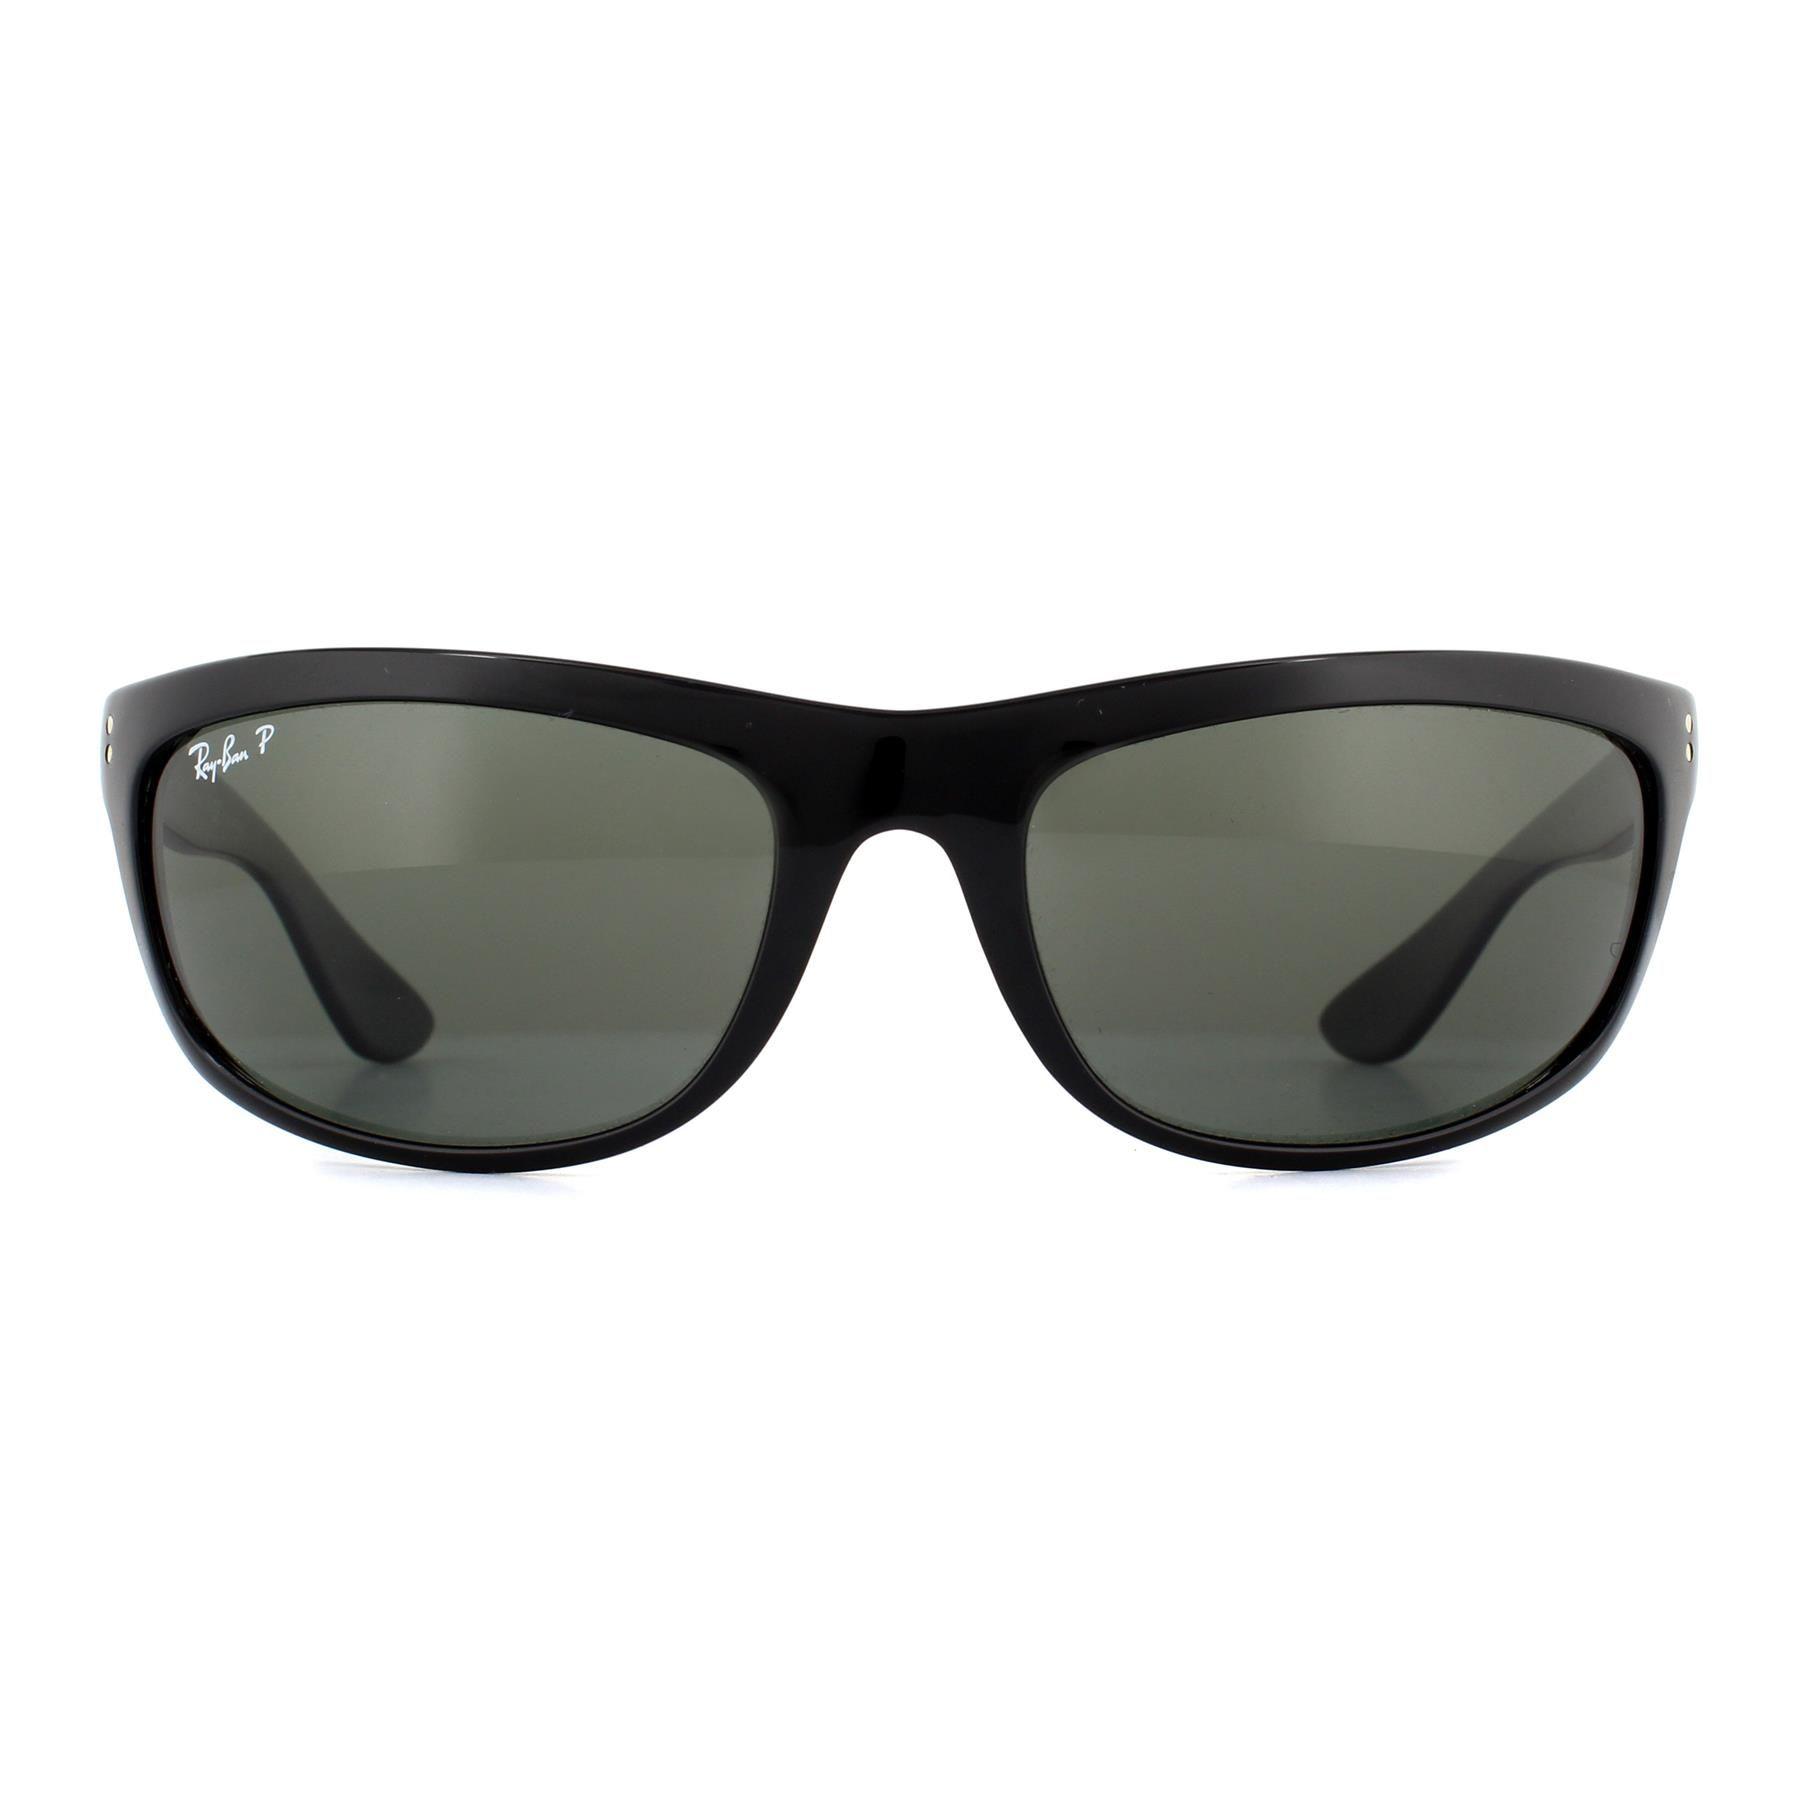 Ray-Ban Sunglasses Balorama 4089 601/58 Black Polarized